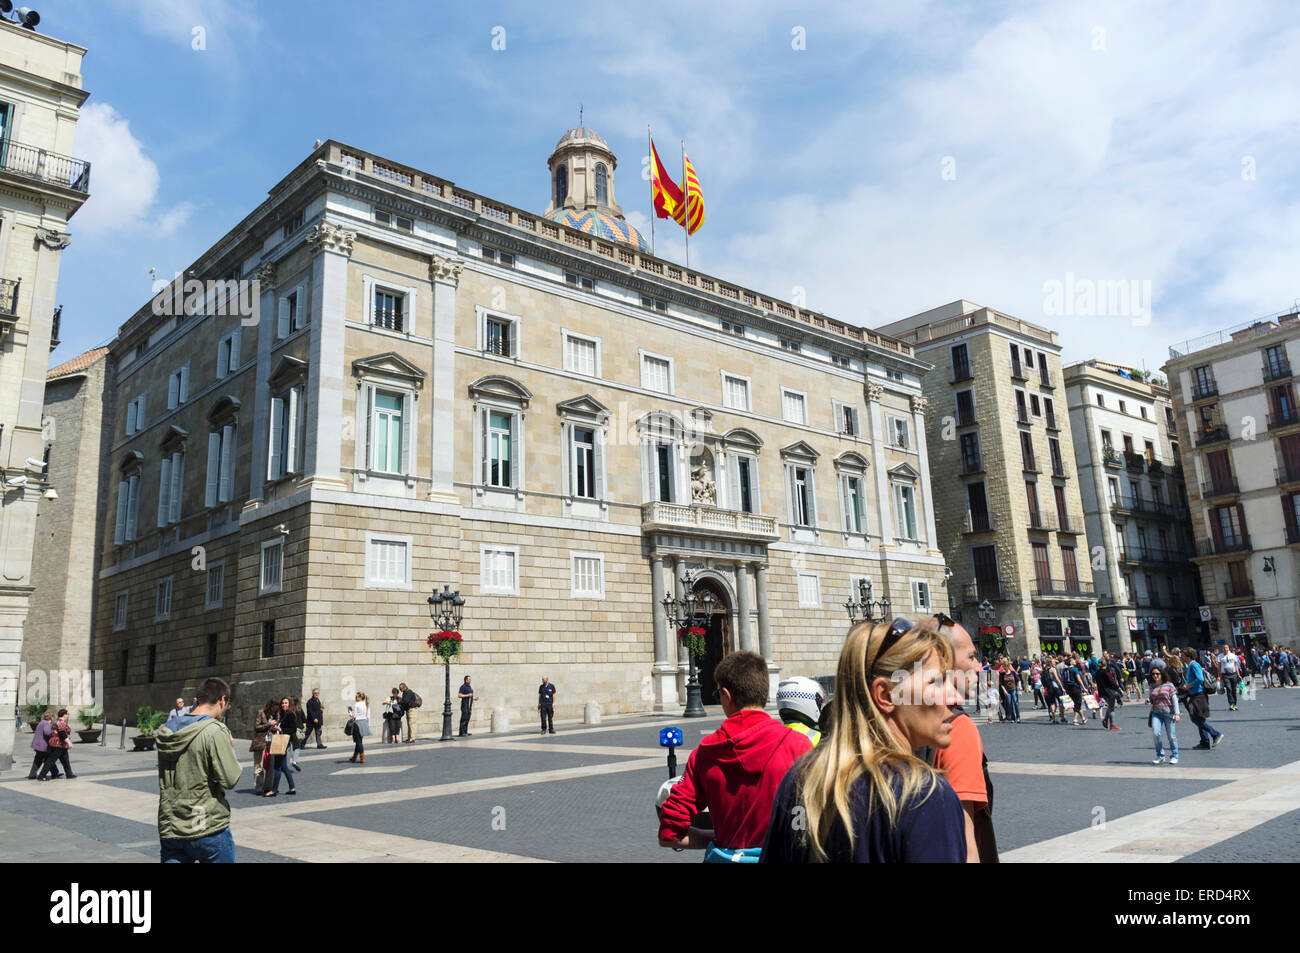 Palau de la Generalitat, Plaça de Sant Jaume, Barcelona, Spain - Stock Image